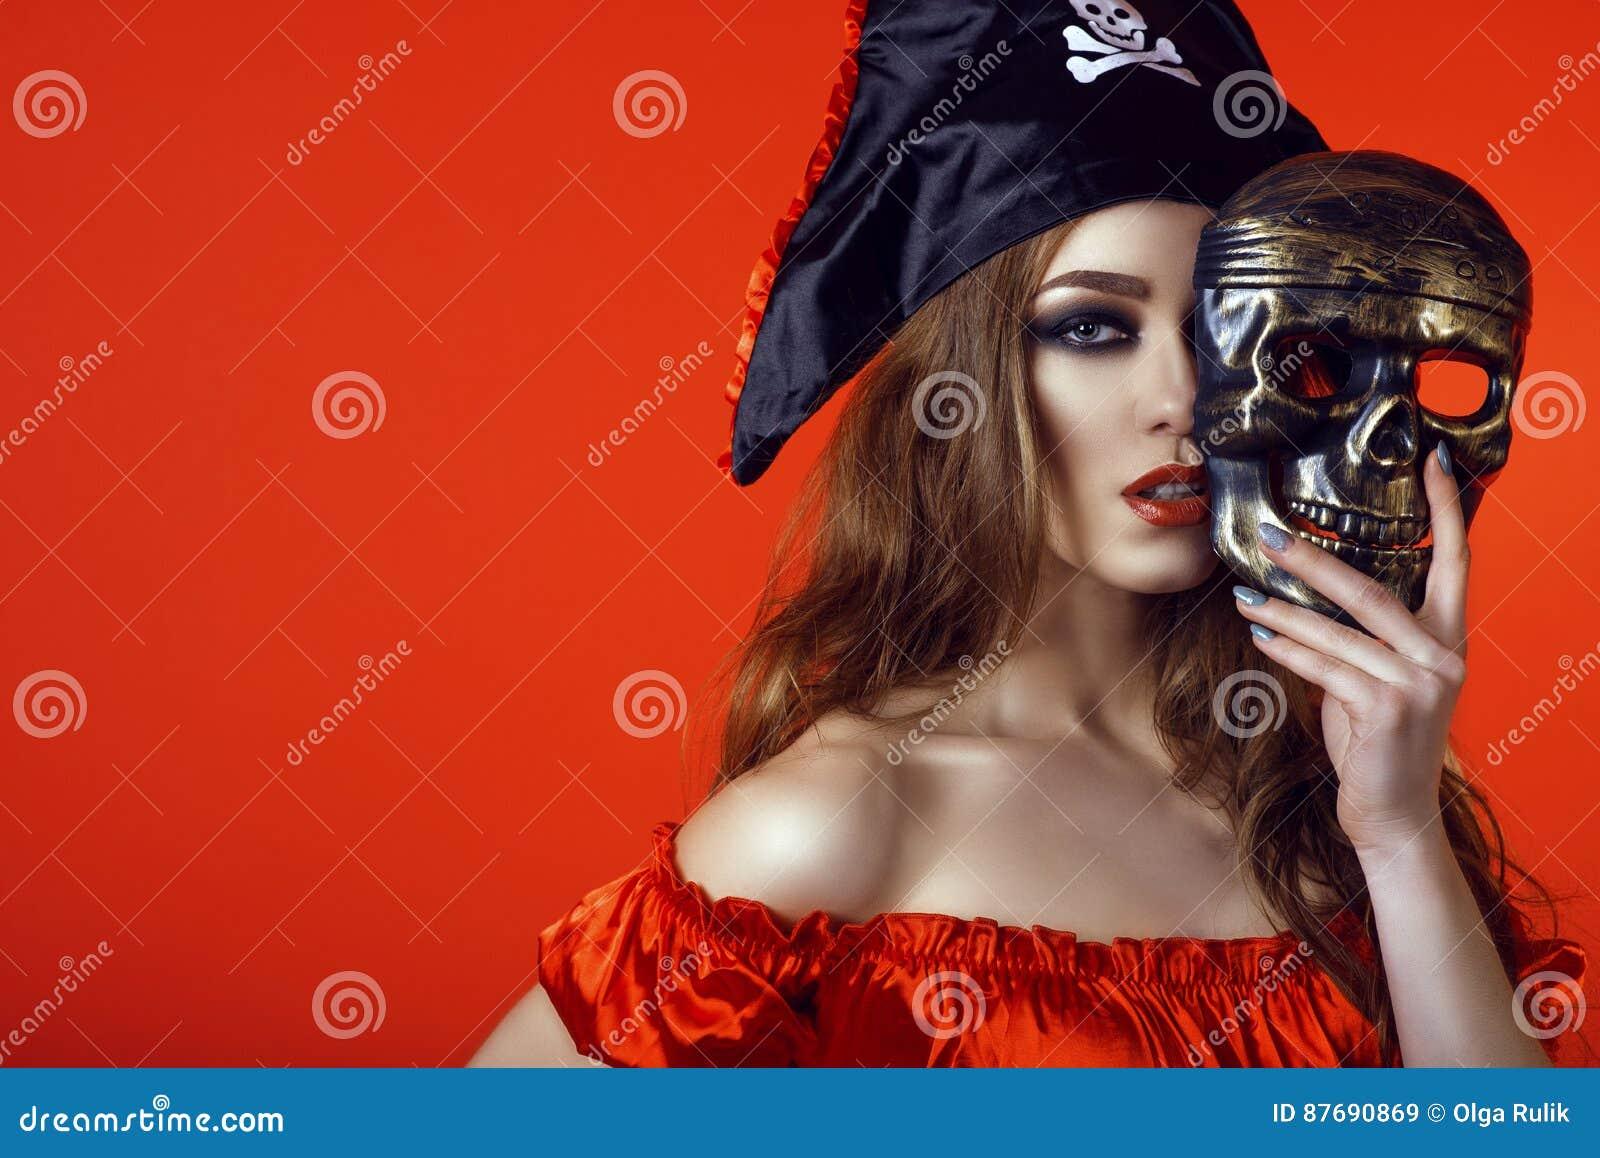 Formula pirate maker sexual 7